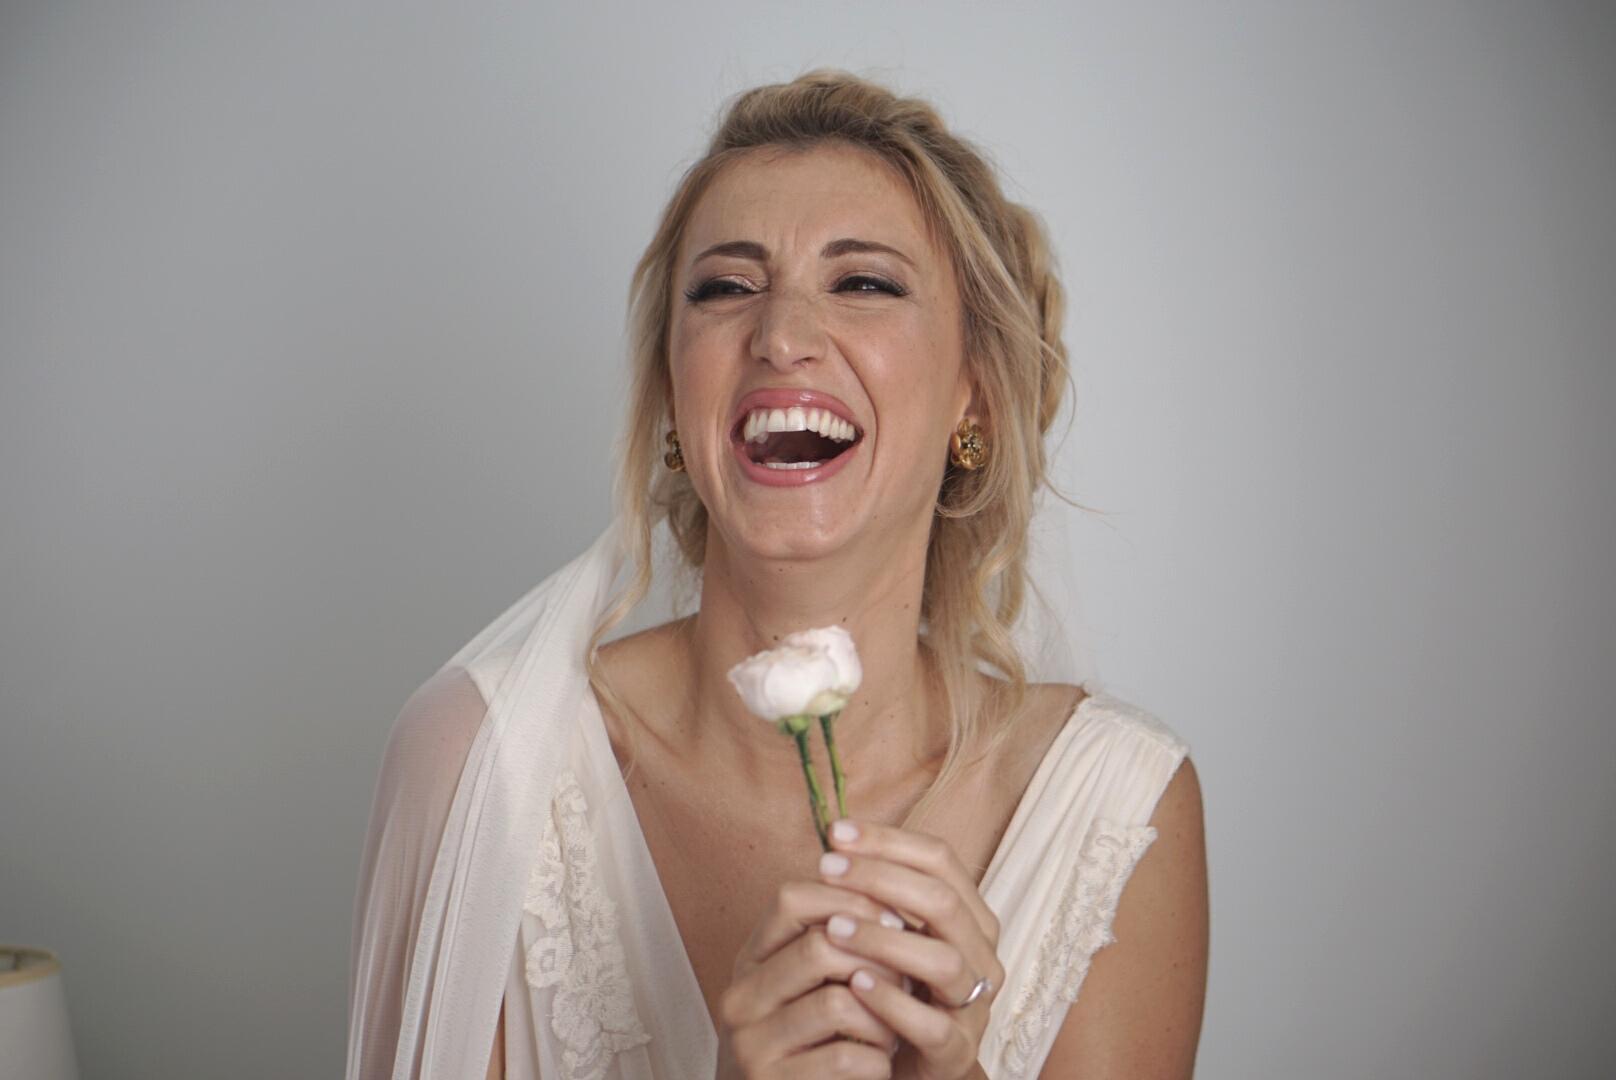 The most happy bride ever!